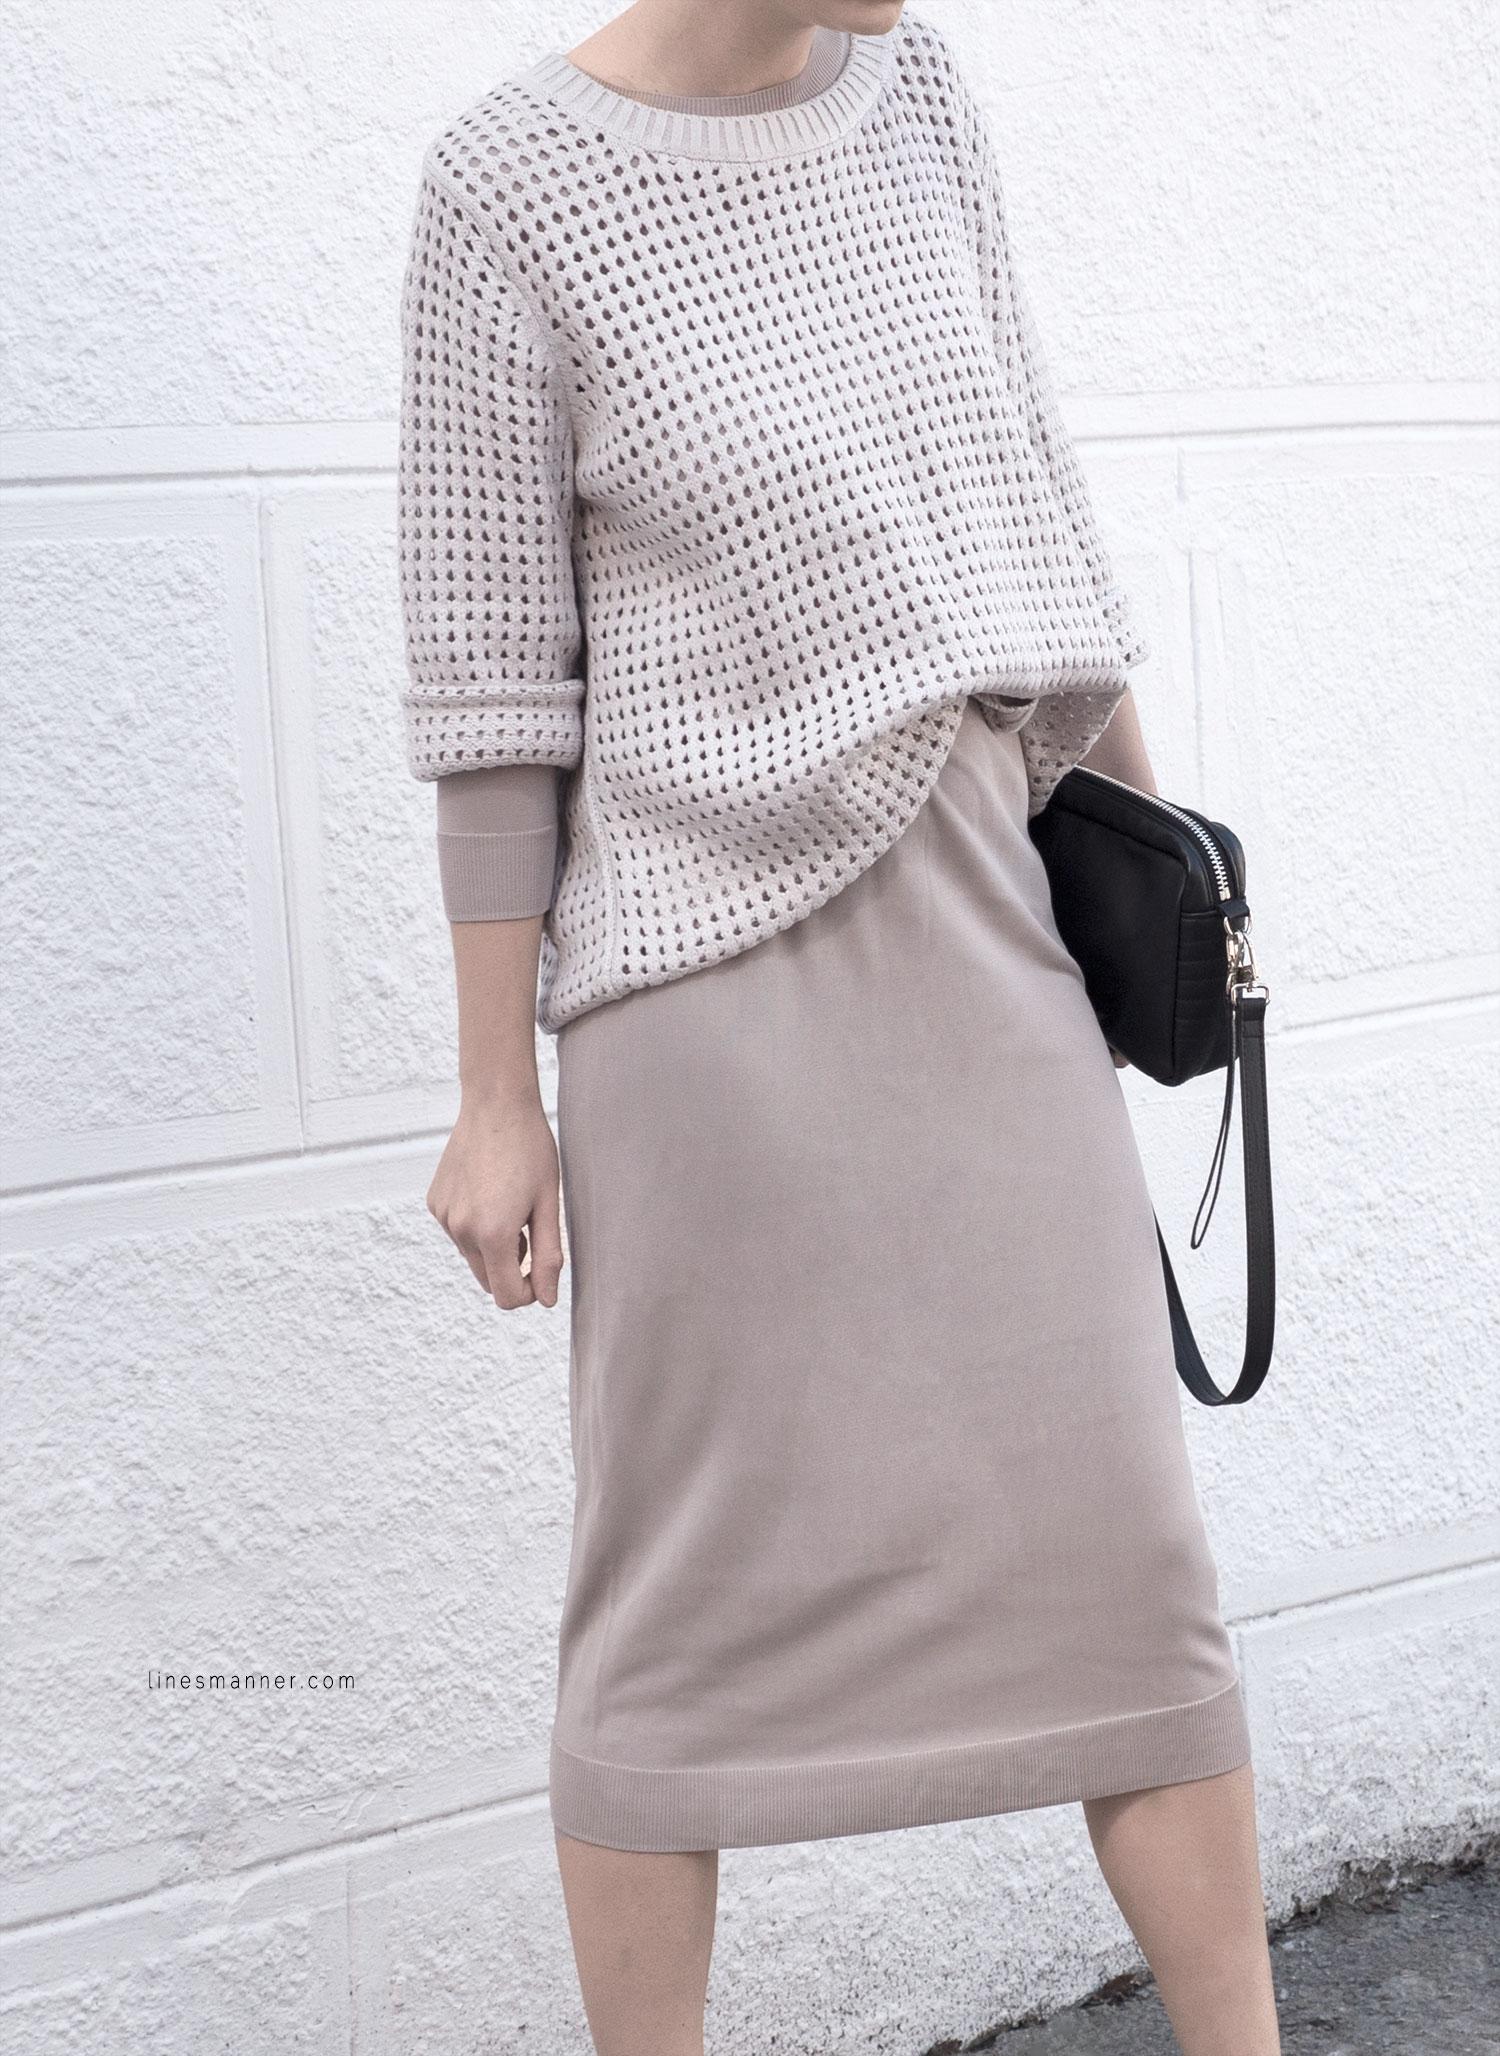 Lines-Manner-Tonal-Shades-Neutrals-Undertones-Essentials-Details-Elegant-Casual-Knit-Maxi_dress-Beige-Cream-Nude-Dimension-Skin-COS-Light-16